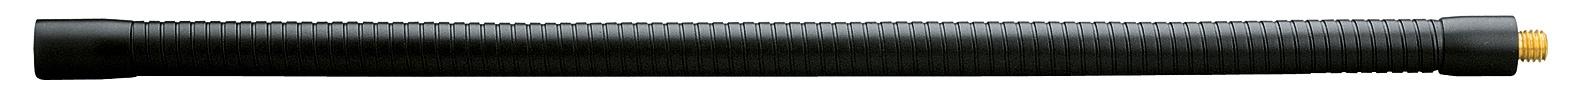 Schwanenhals